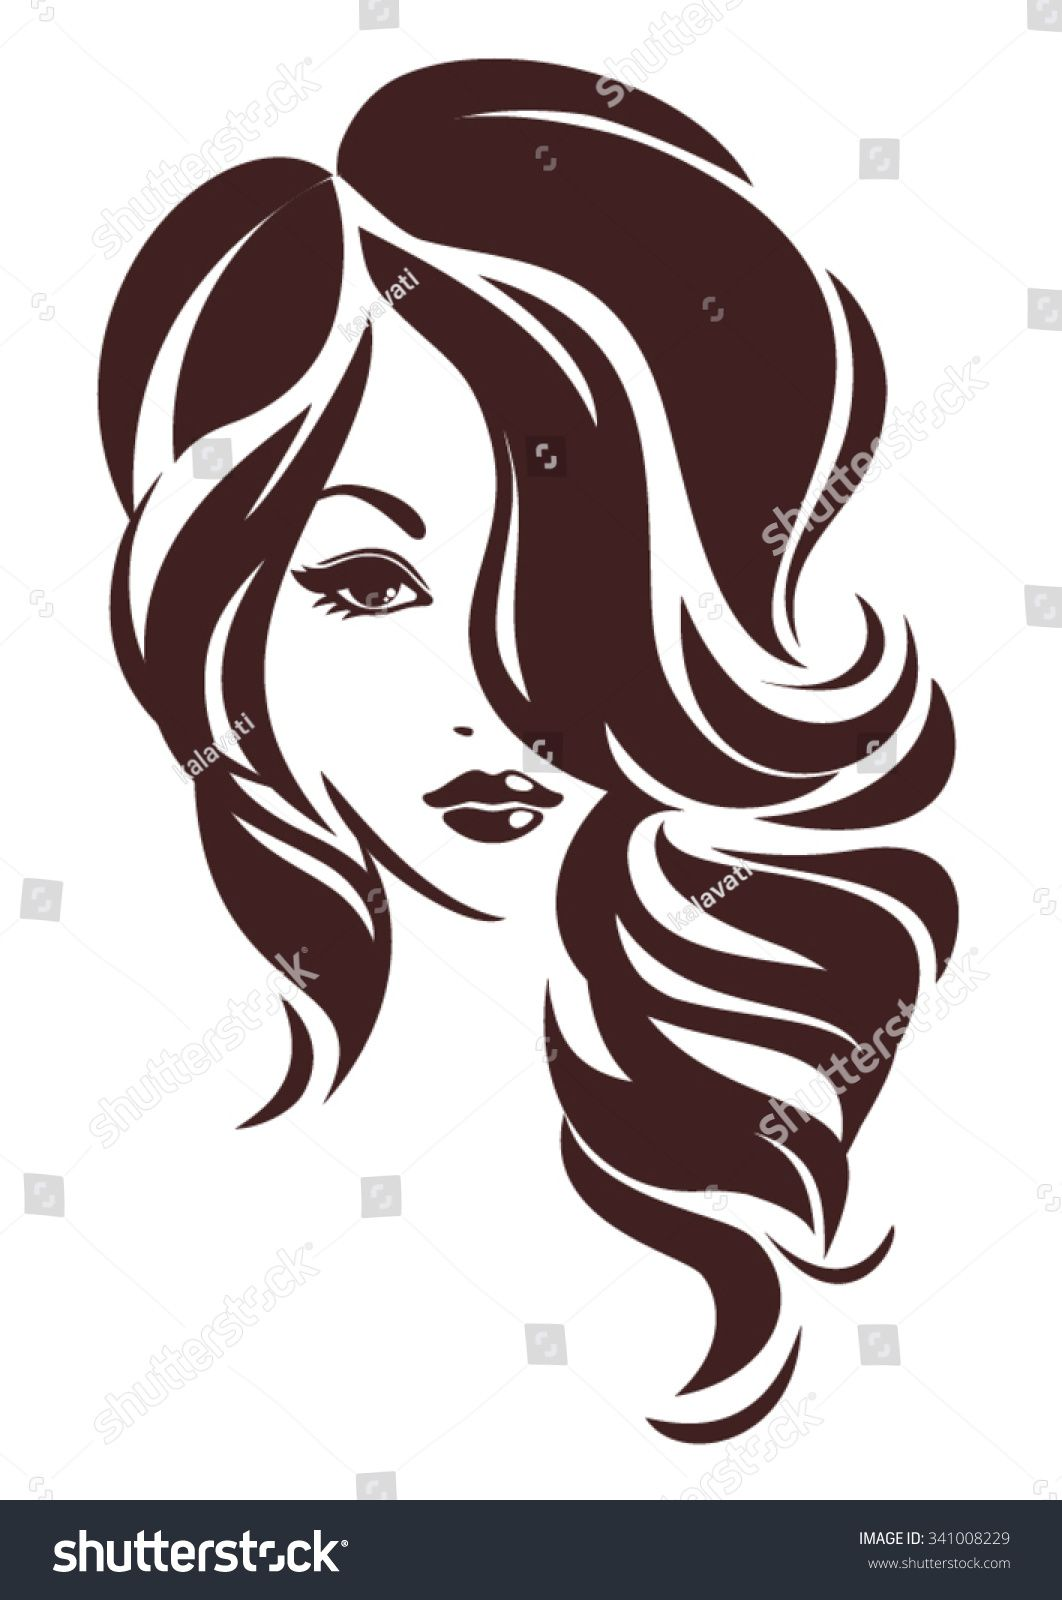 Girl with hair loose, vector logo design in 2019.